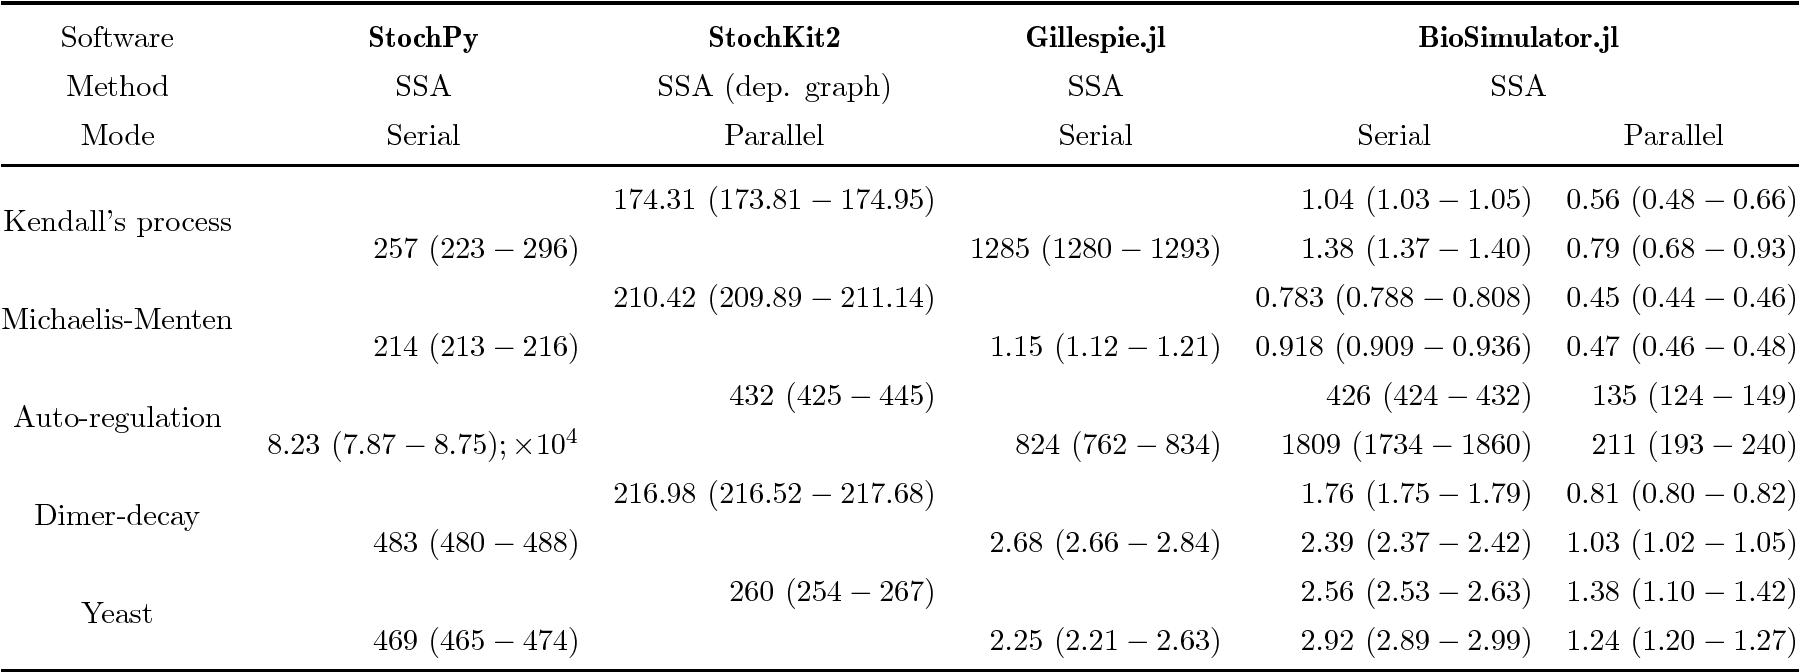 Table 4 from BioSimulator jl: Stochastic simulation in Julia